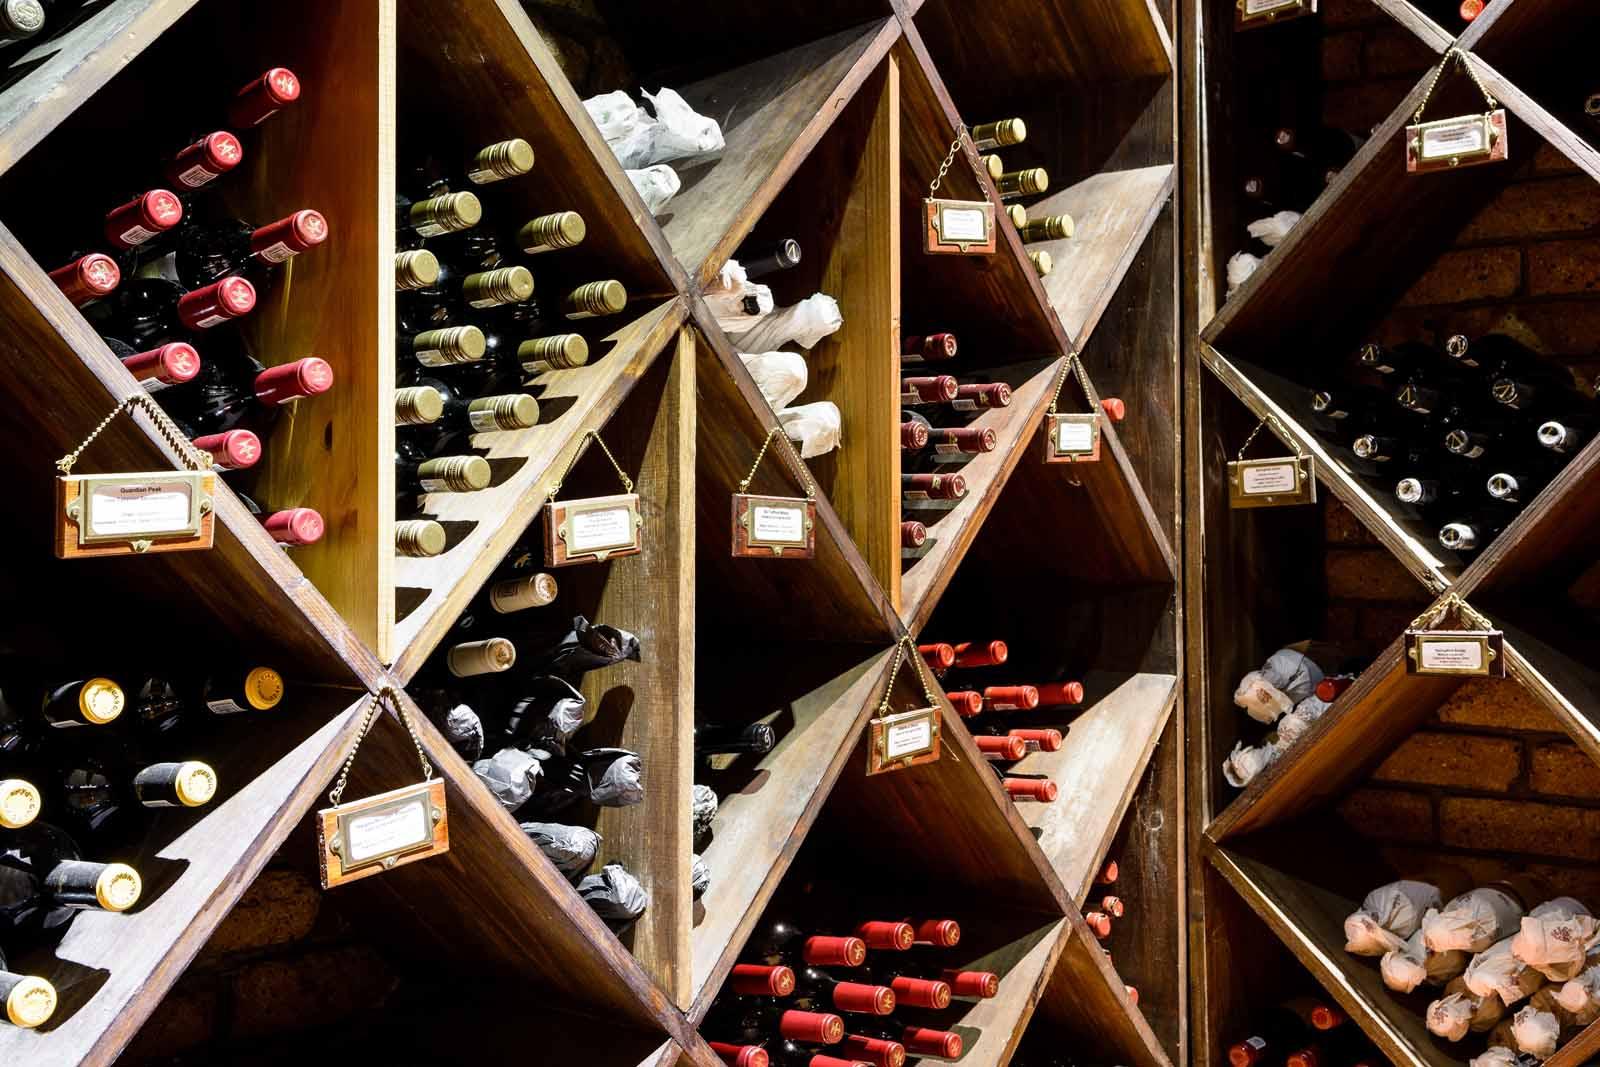 Singita wine cellar